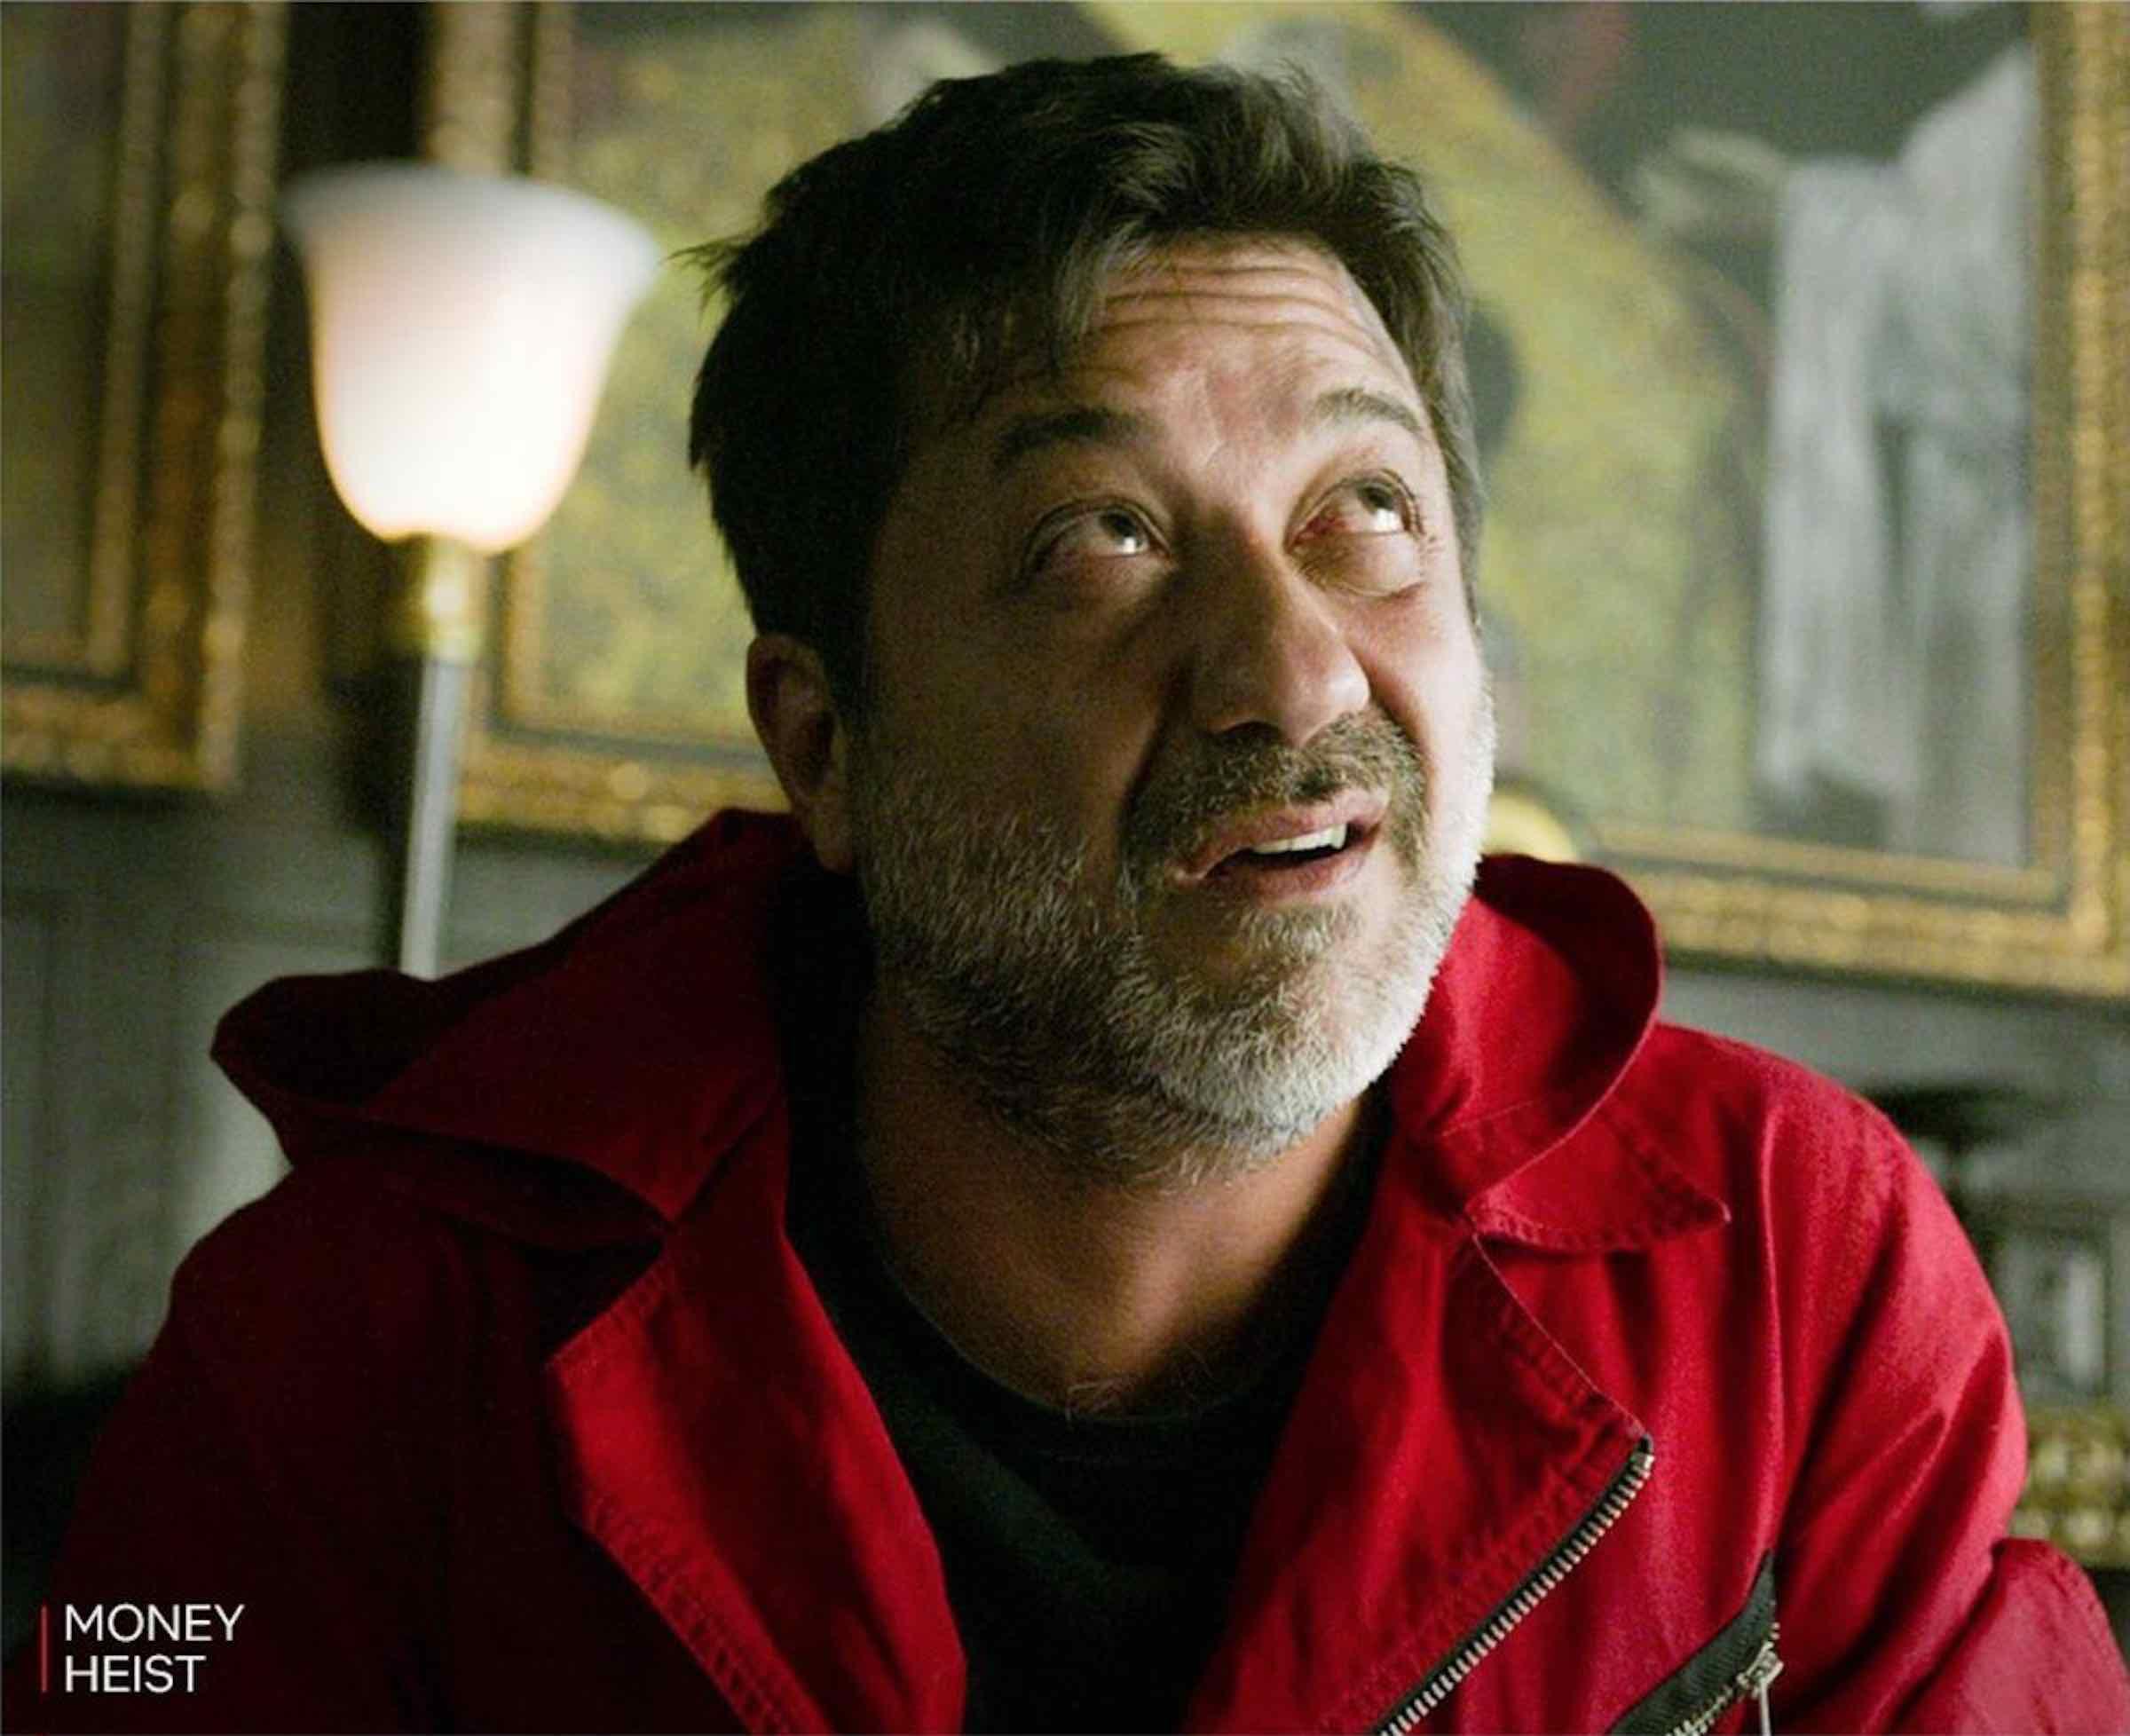 Money Heist' season 4: How will the gang punish Arturo Román? – Film Daily